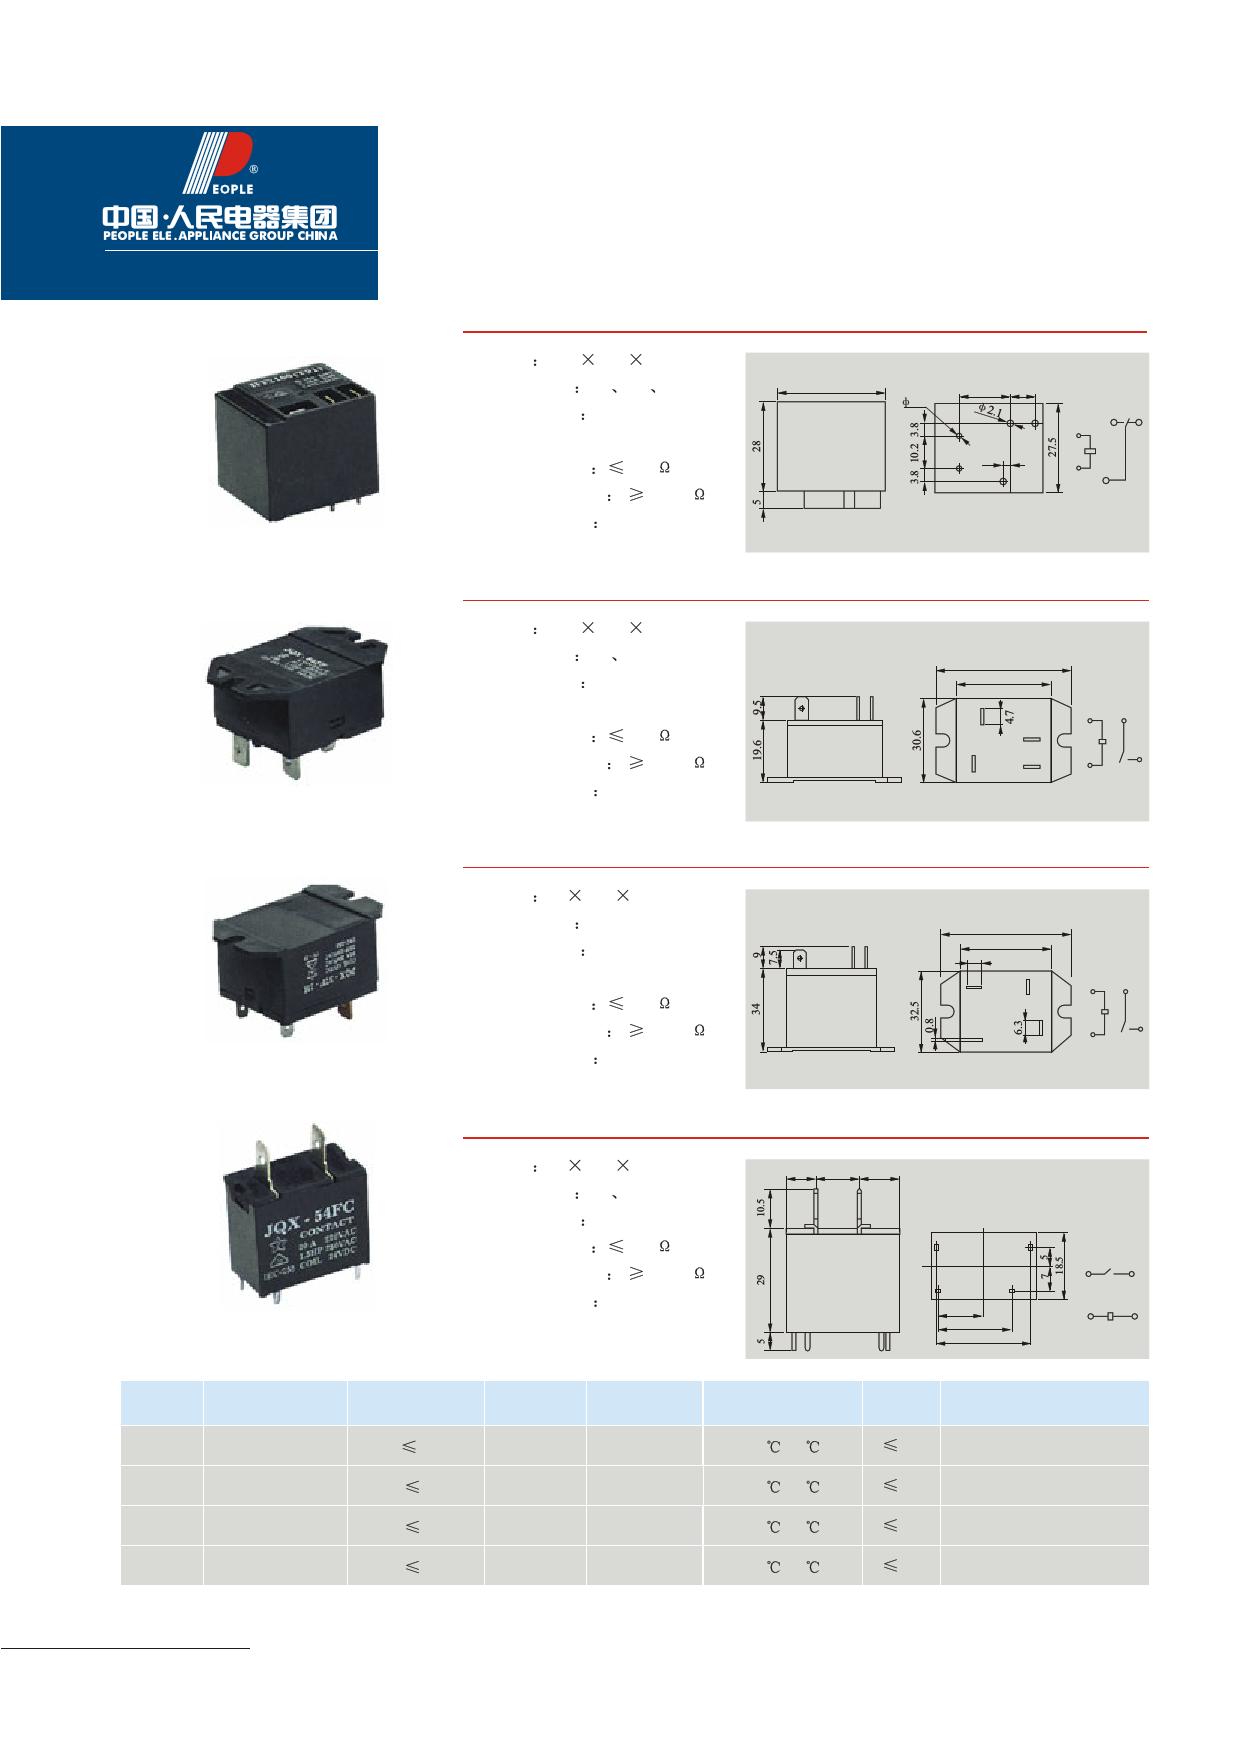 JQX-54FF دیتاشیت PDF